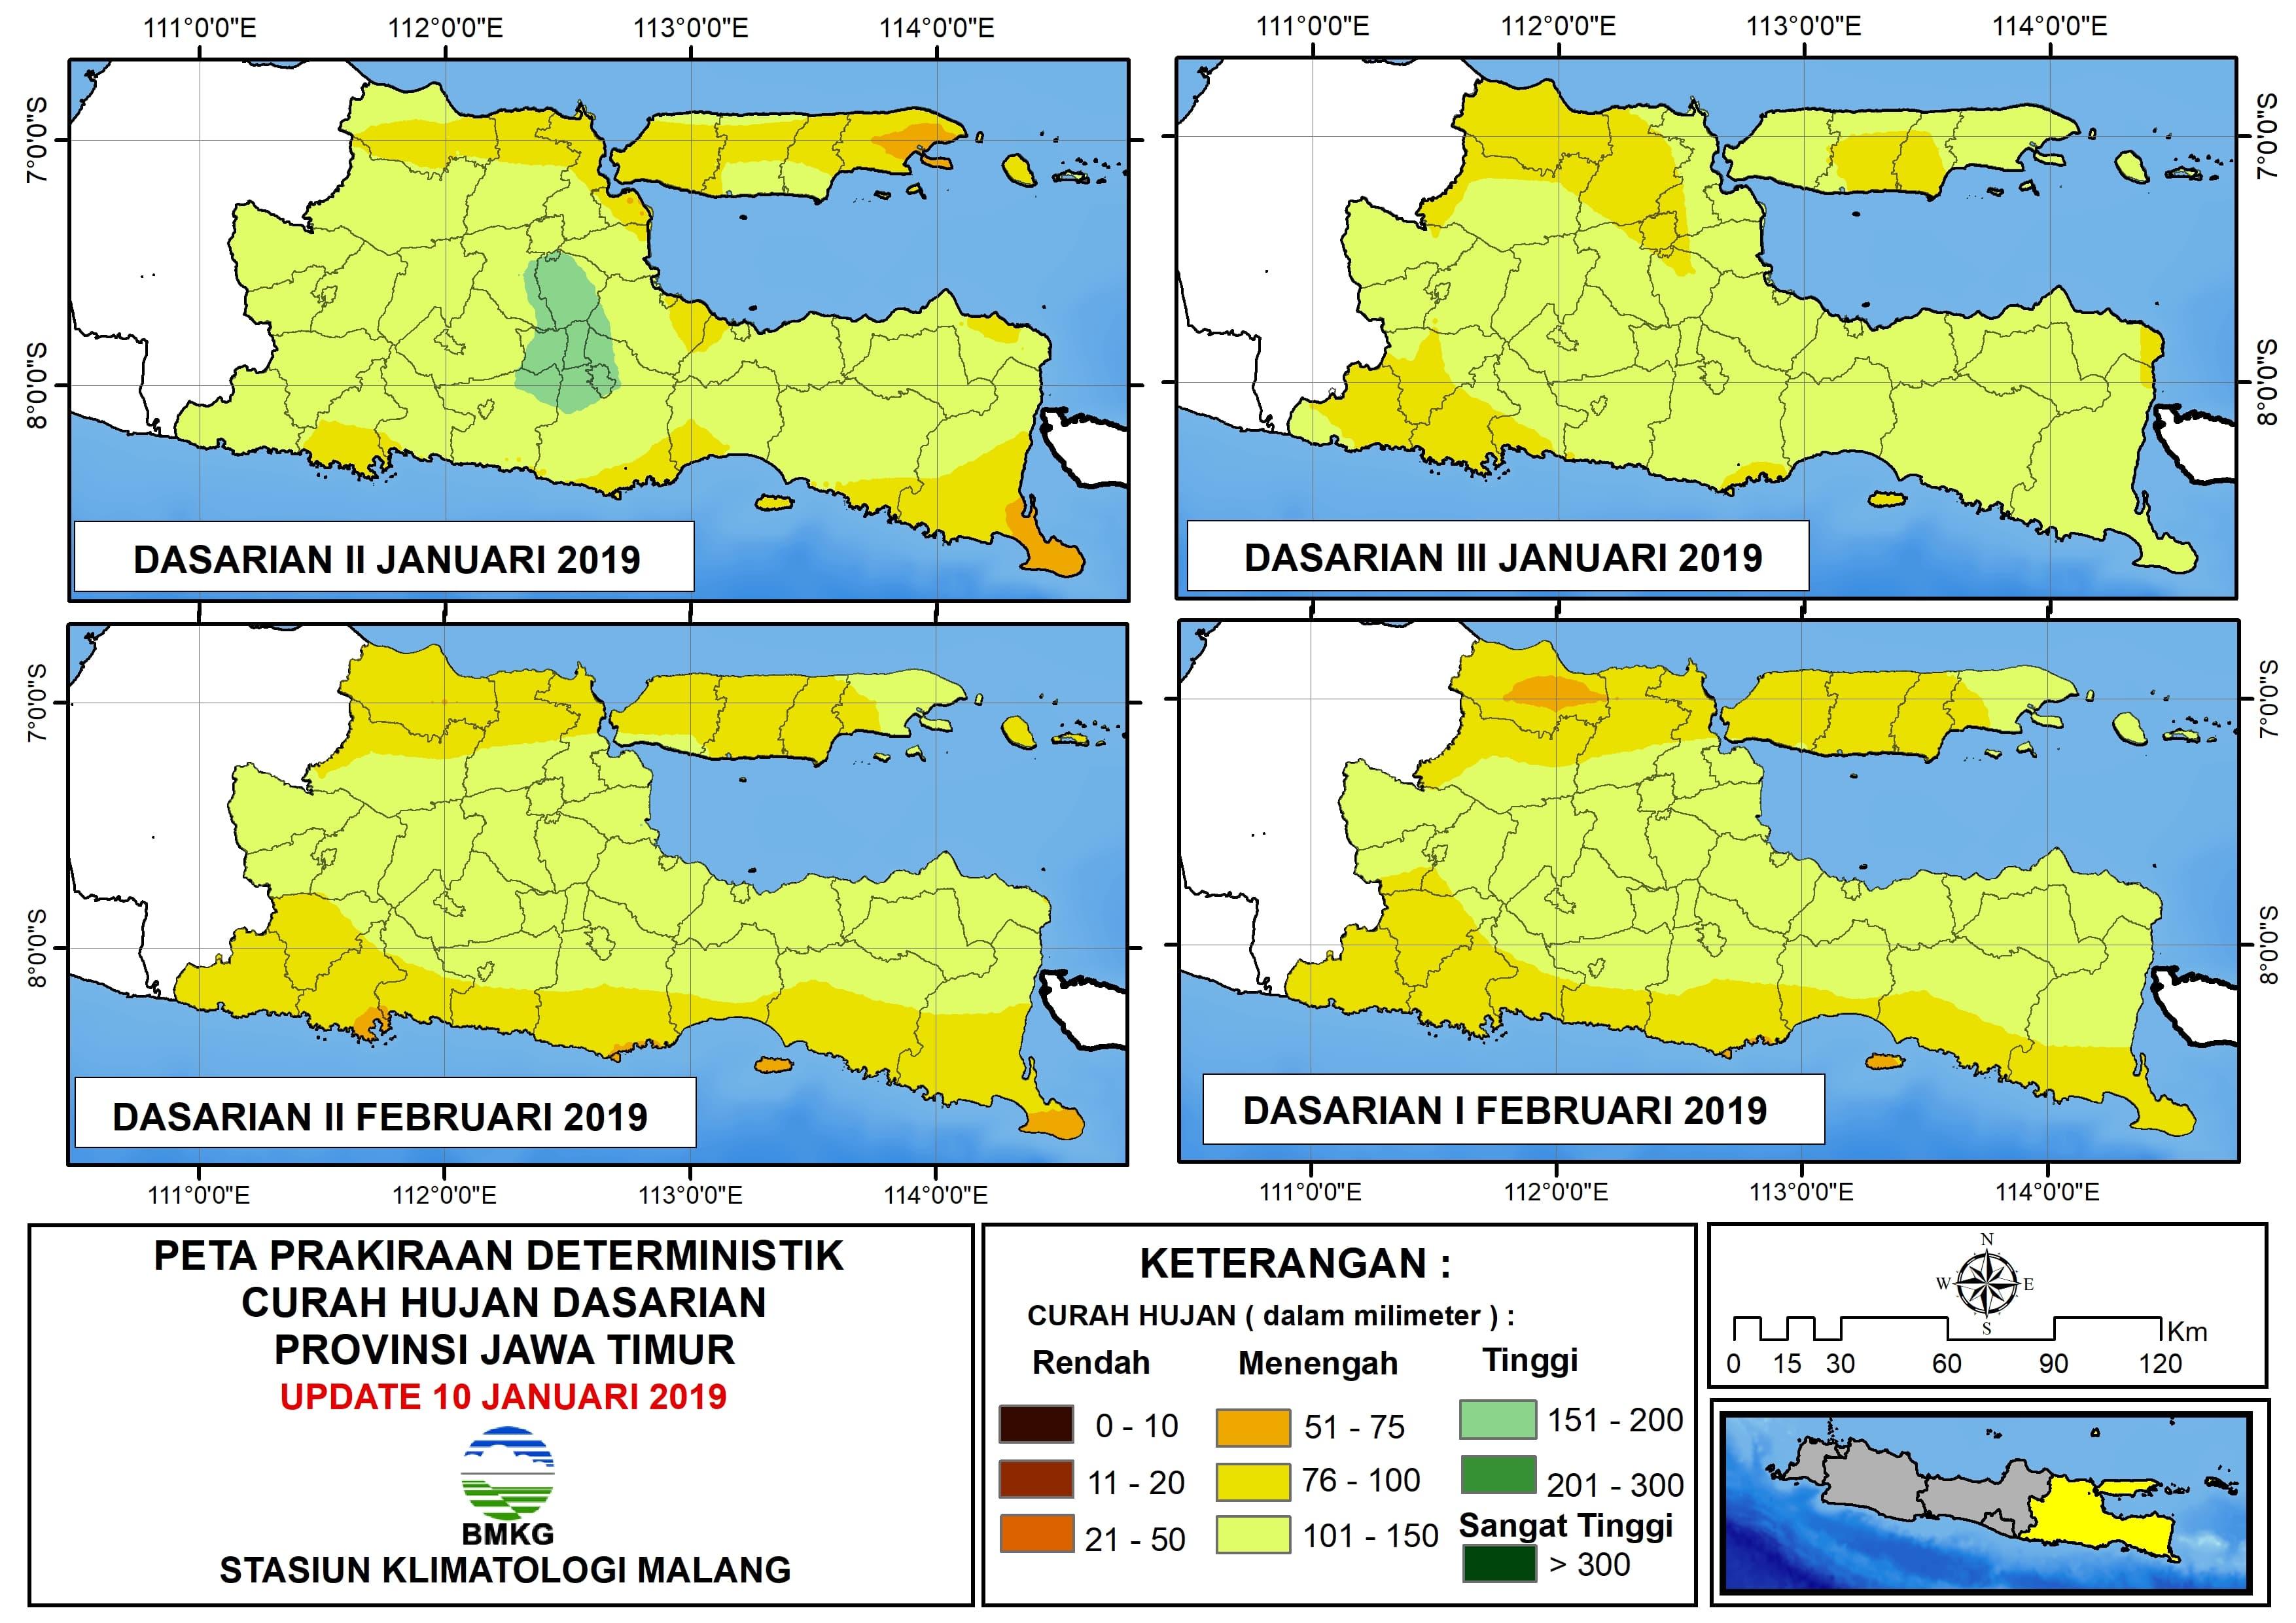 Peta Prakiraan Deterministik Curah Hujan Dasarian Provinsi Jawa Timur Update 10 Januari 2019